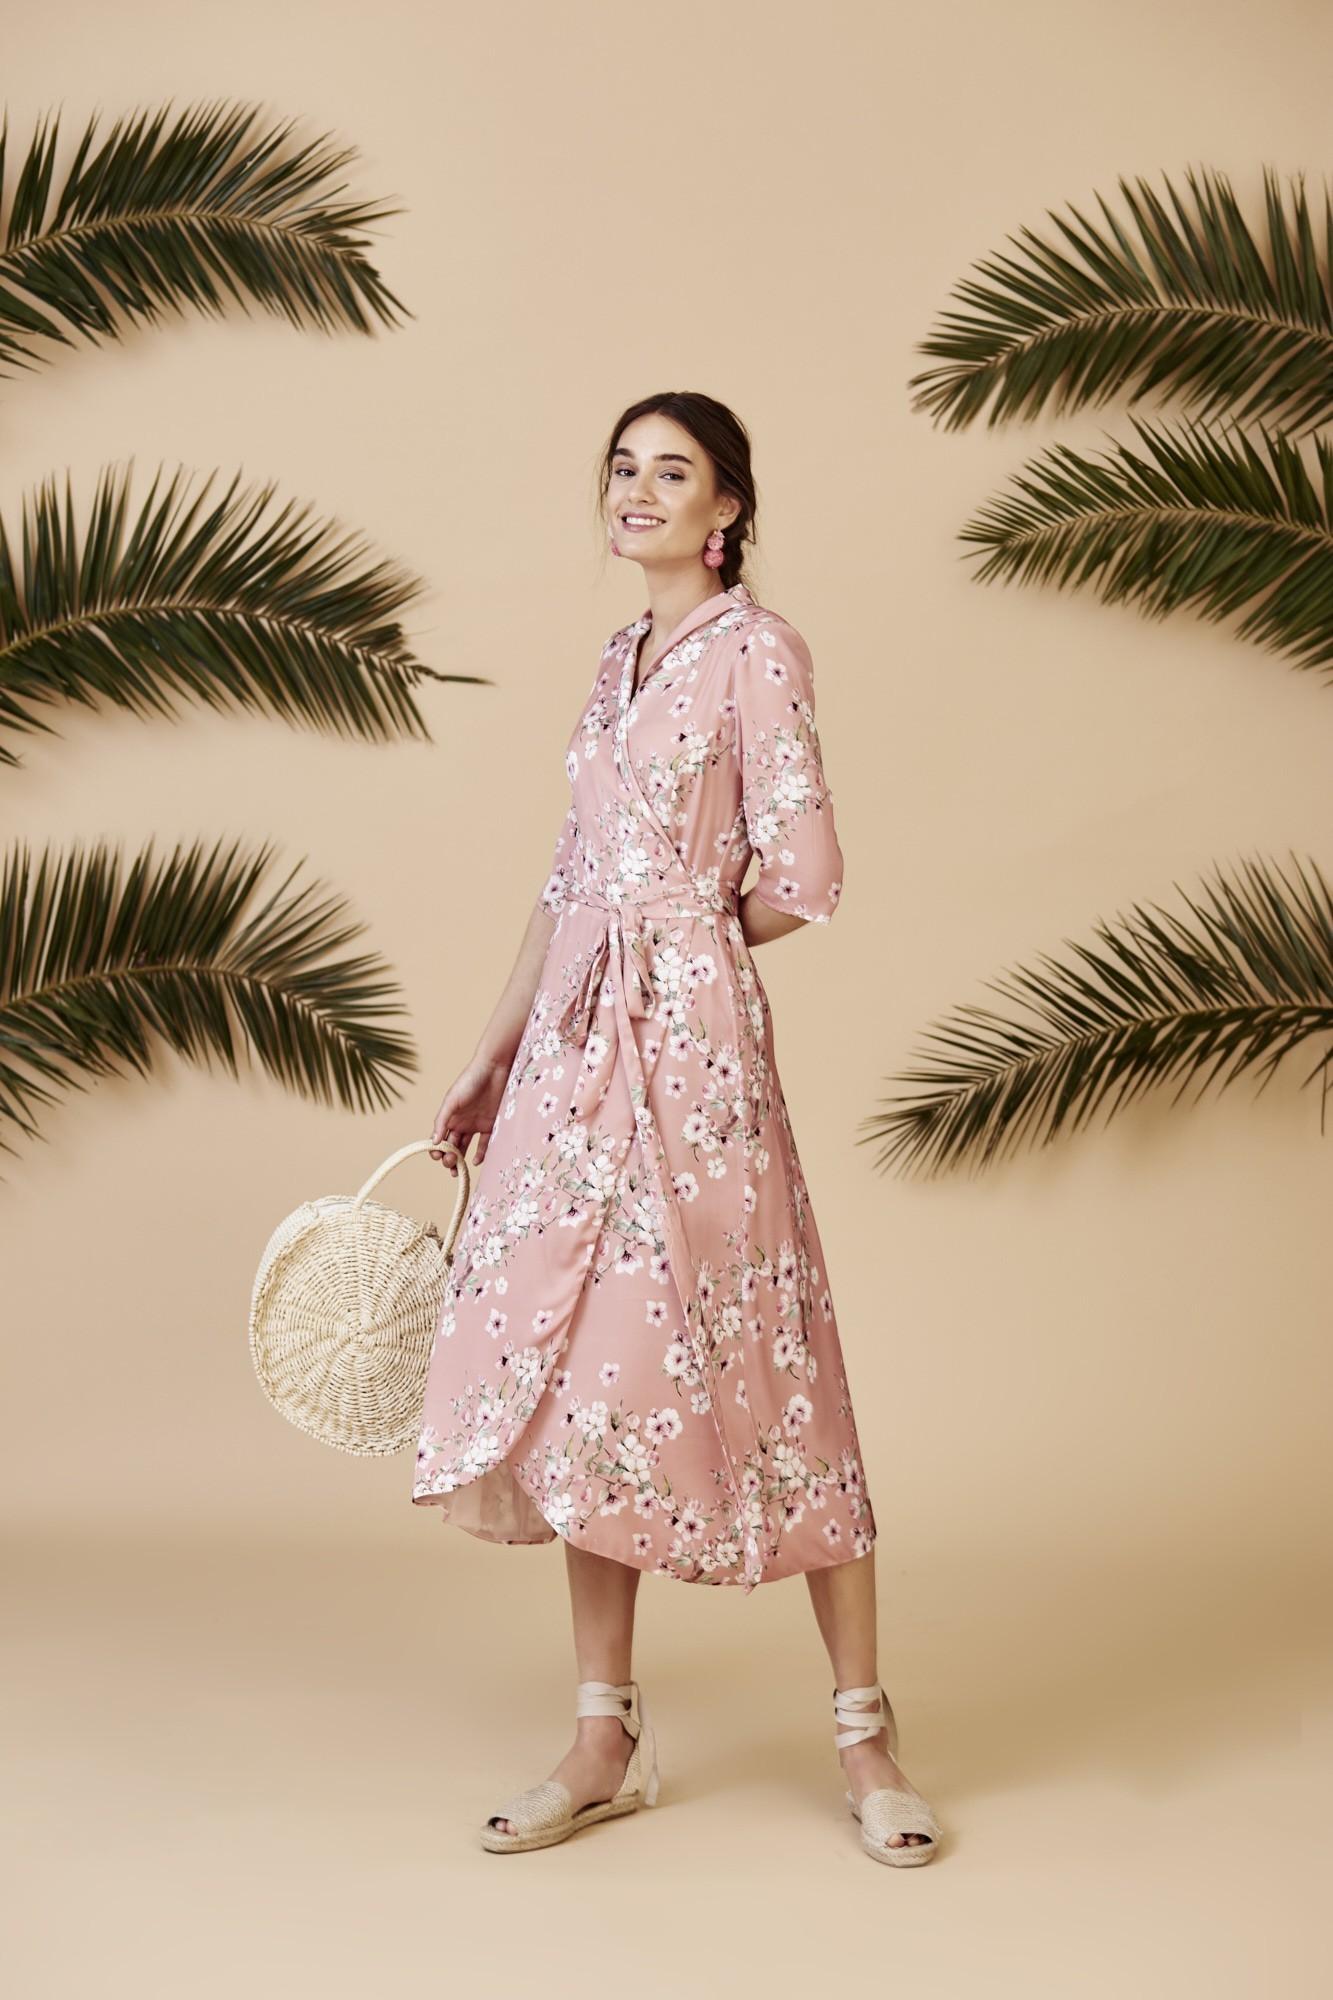 SILVANA PINK DRESS